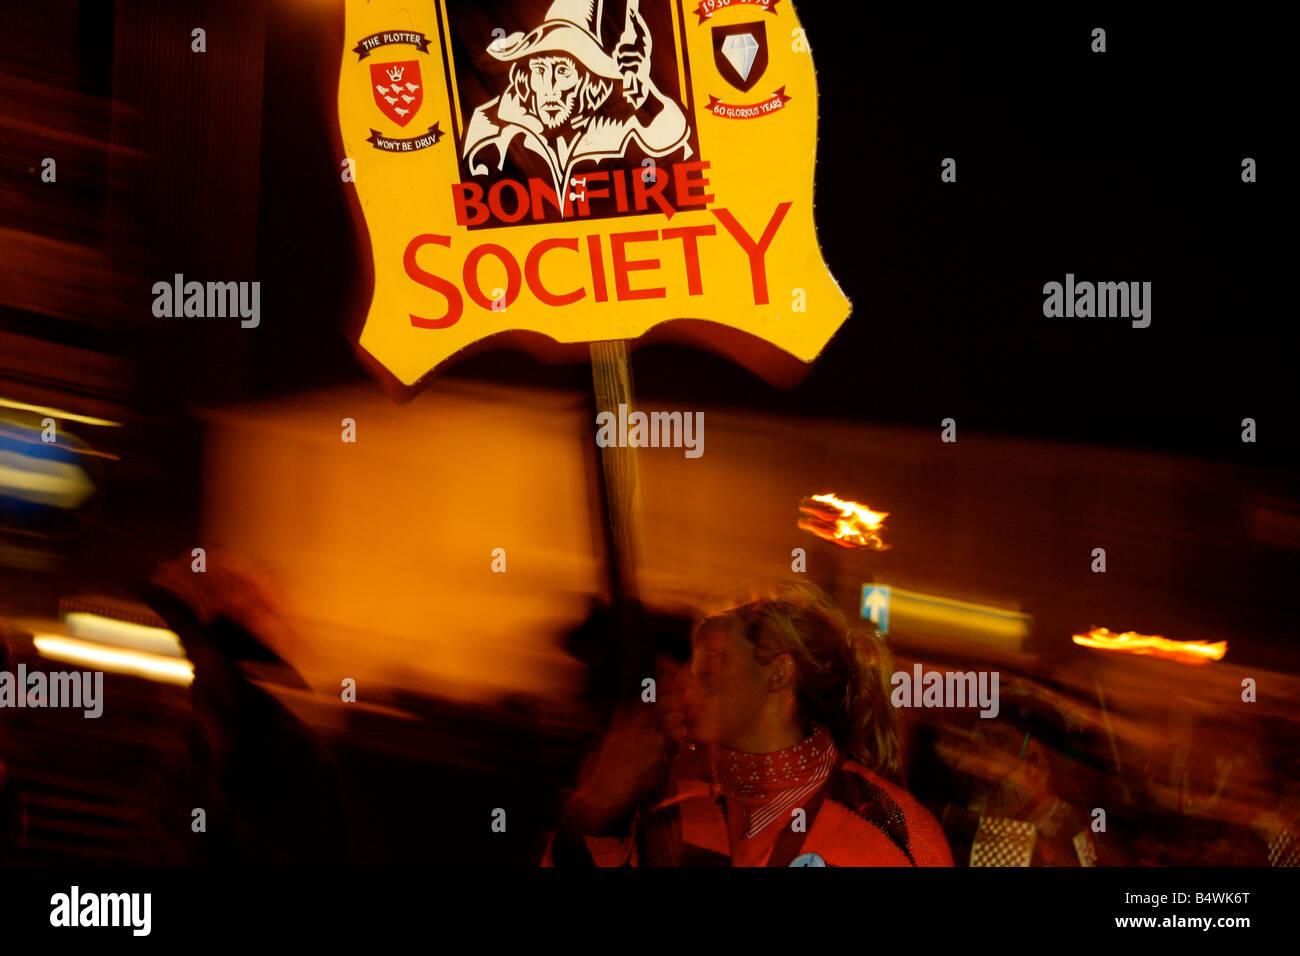 BONFIRE SOCIETY SIGN BANNER GUY FAWKES PARADE NOVEMBER 5 LEWES FIREWORKS - Stock Image